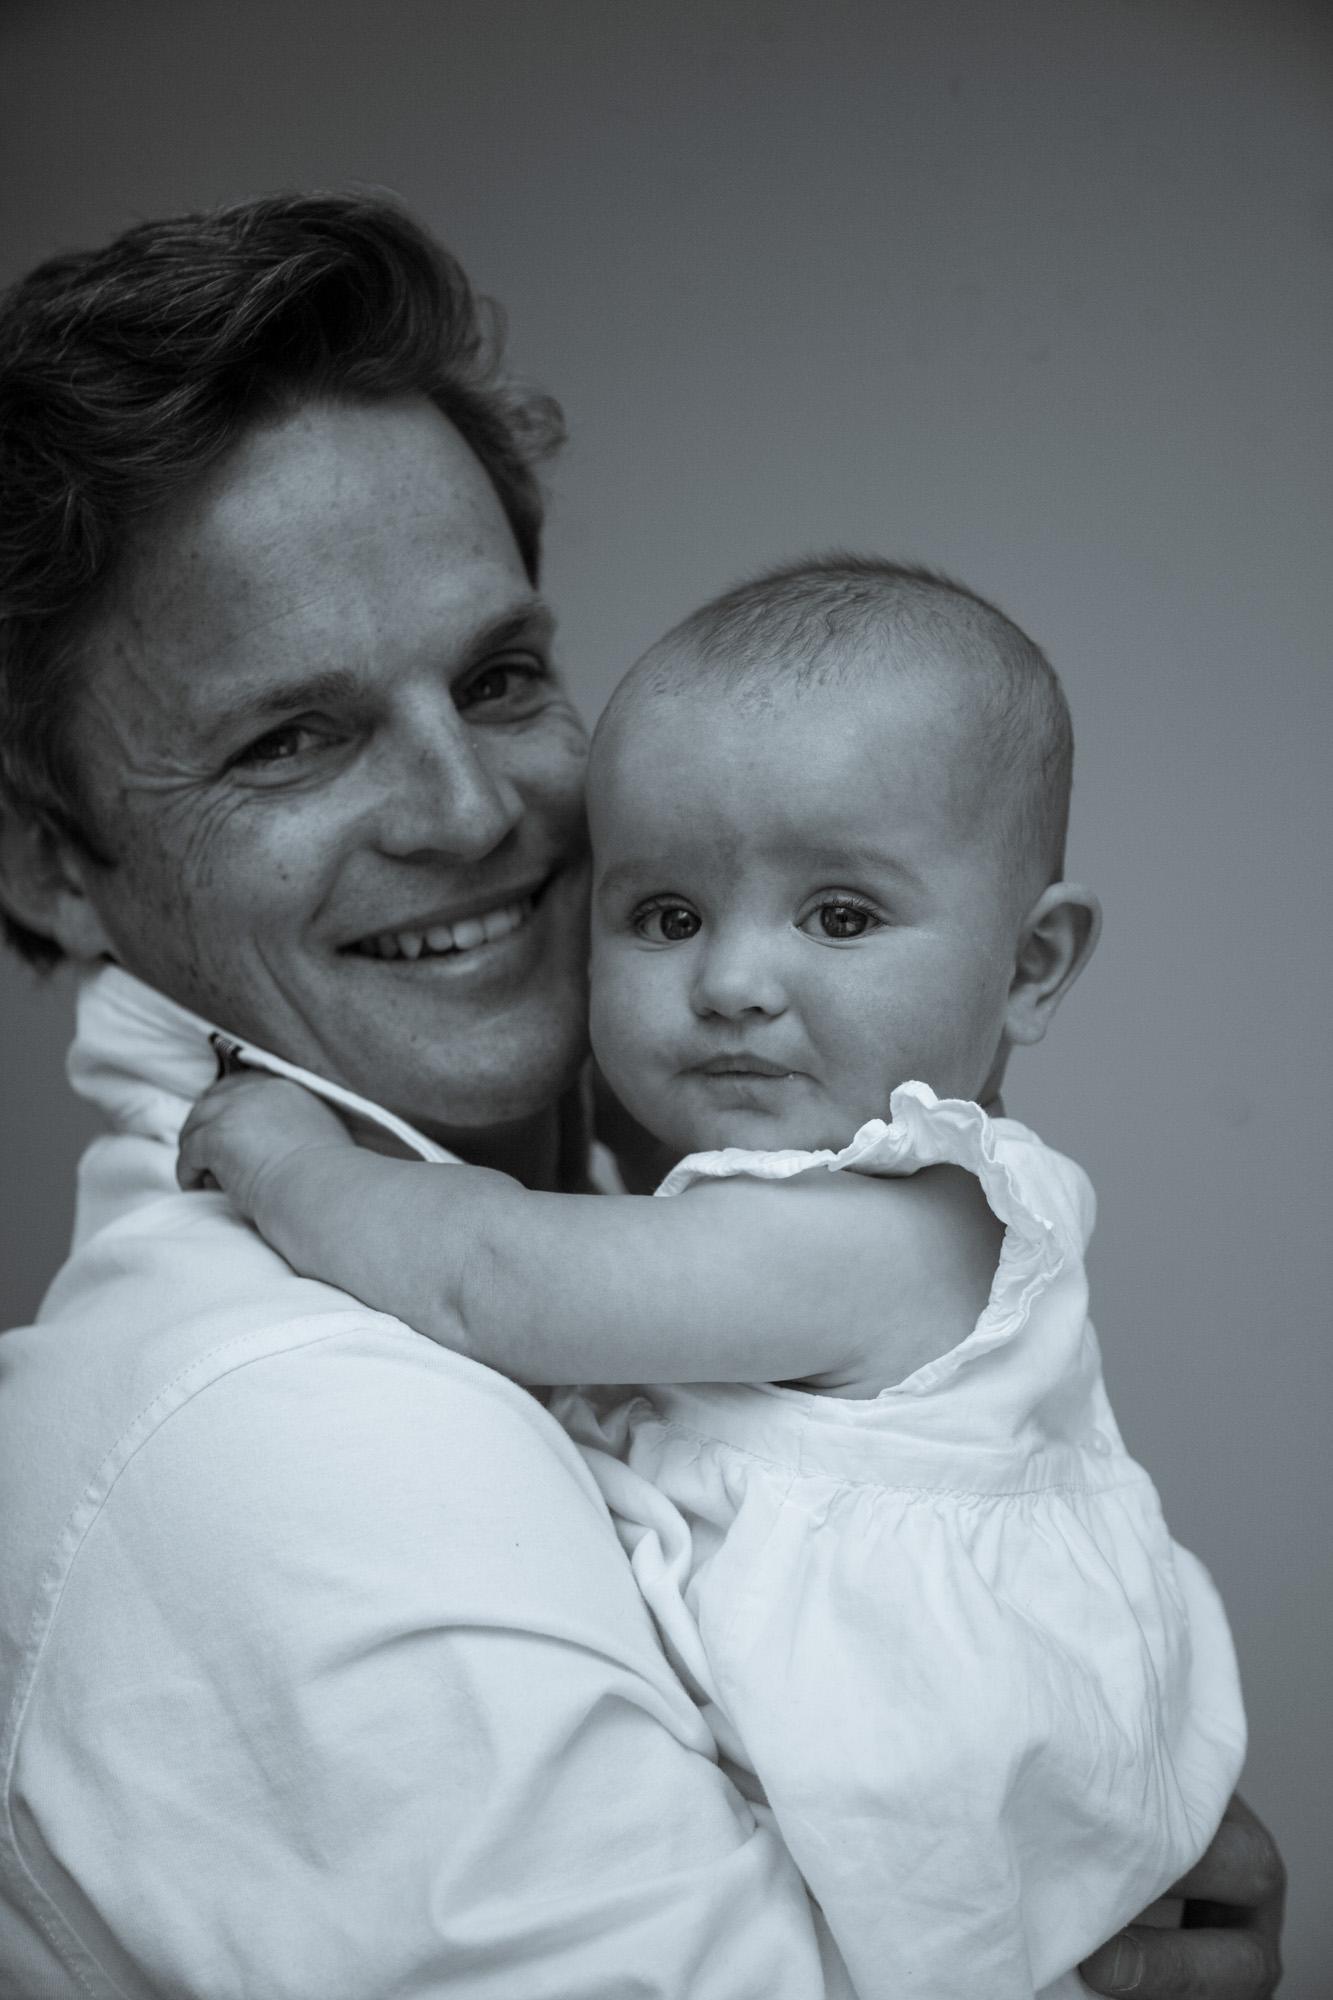 family-life-family-photographer-oxford-london-jonathan-self-photography-5.jpg